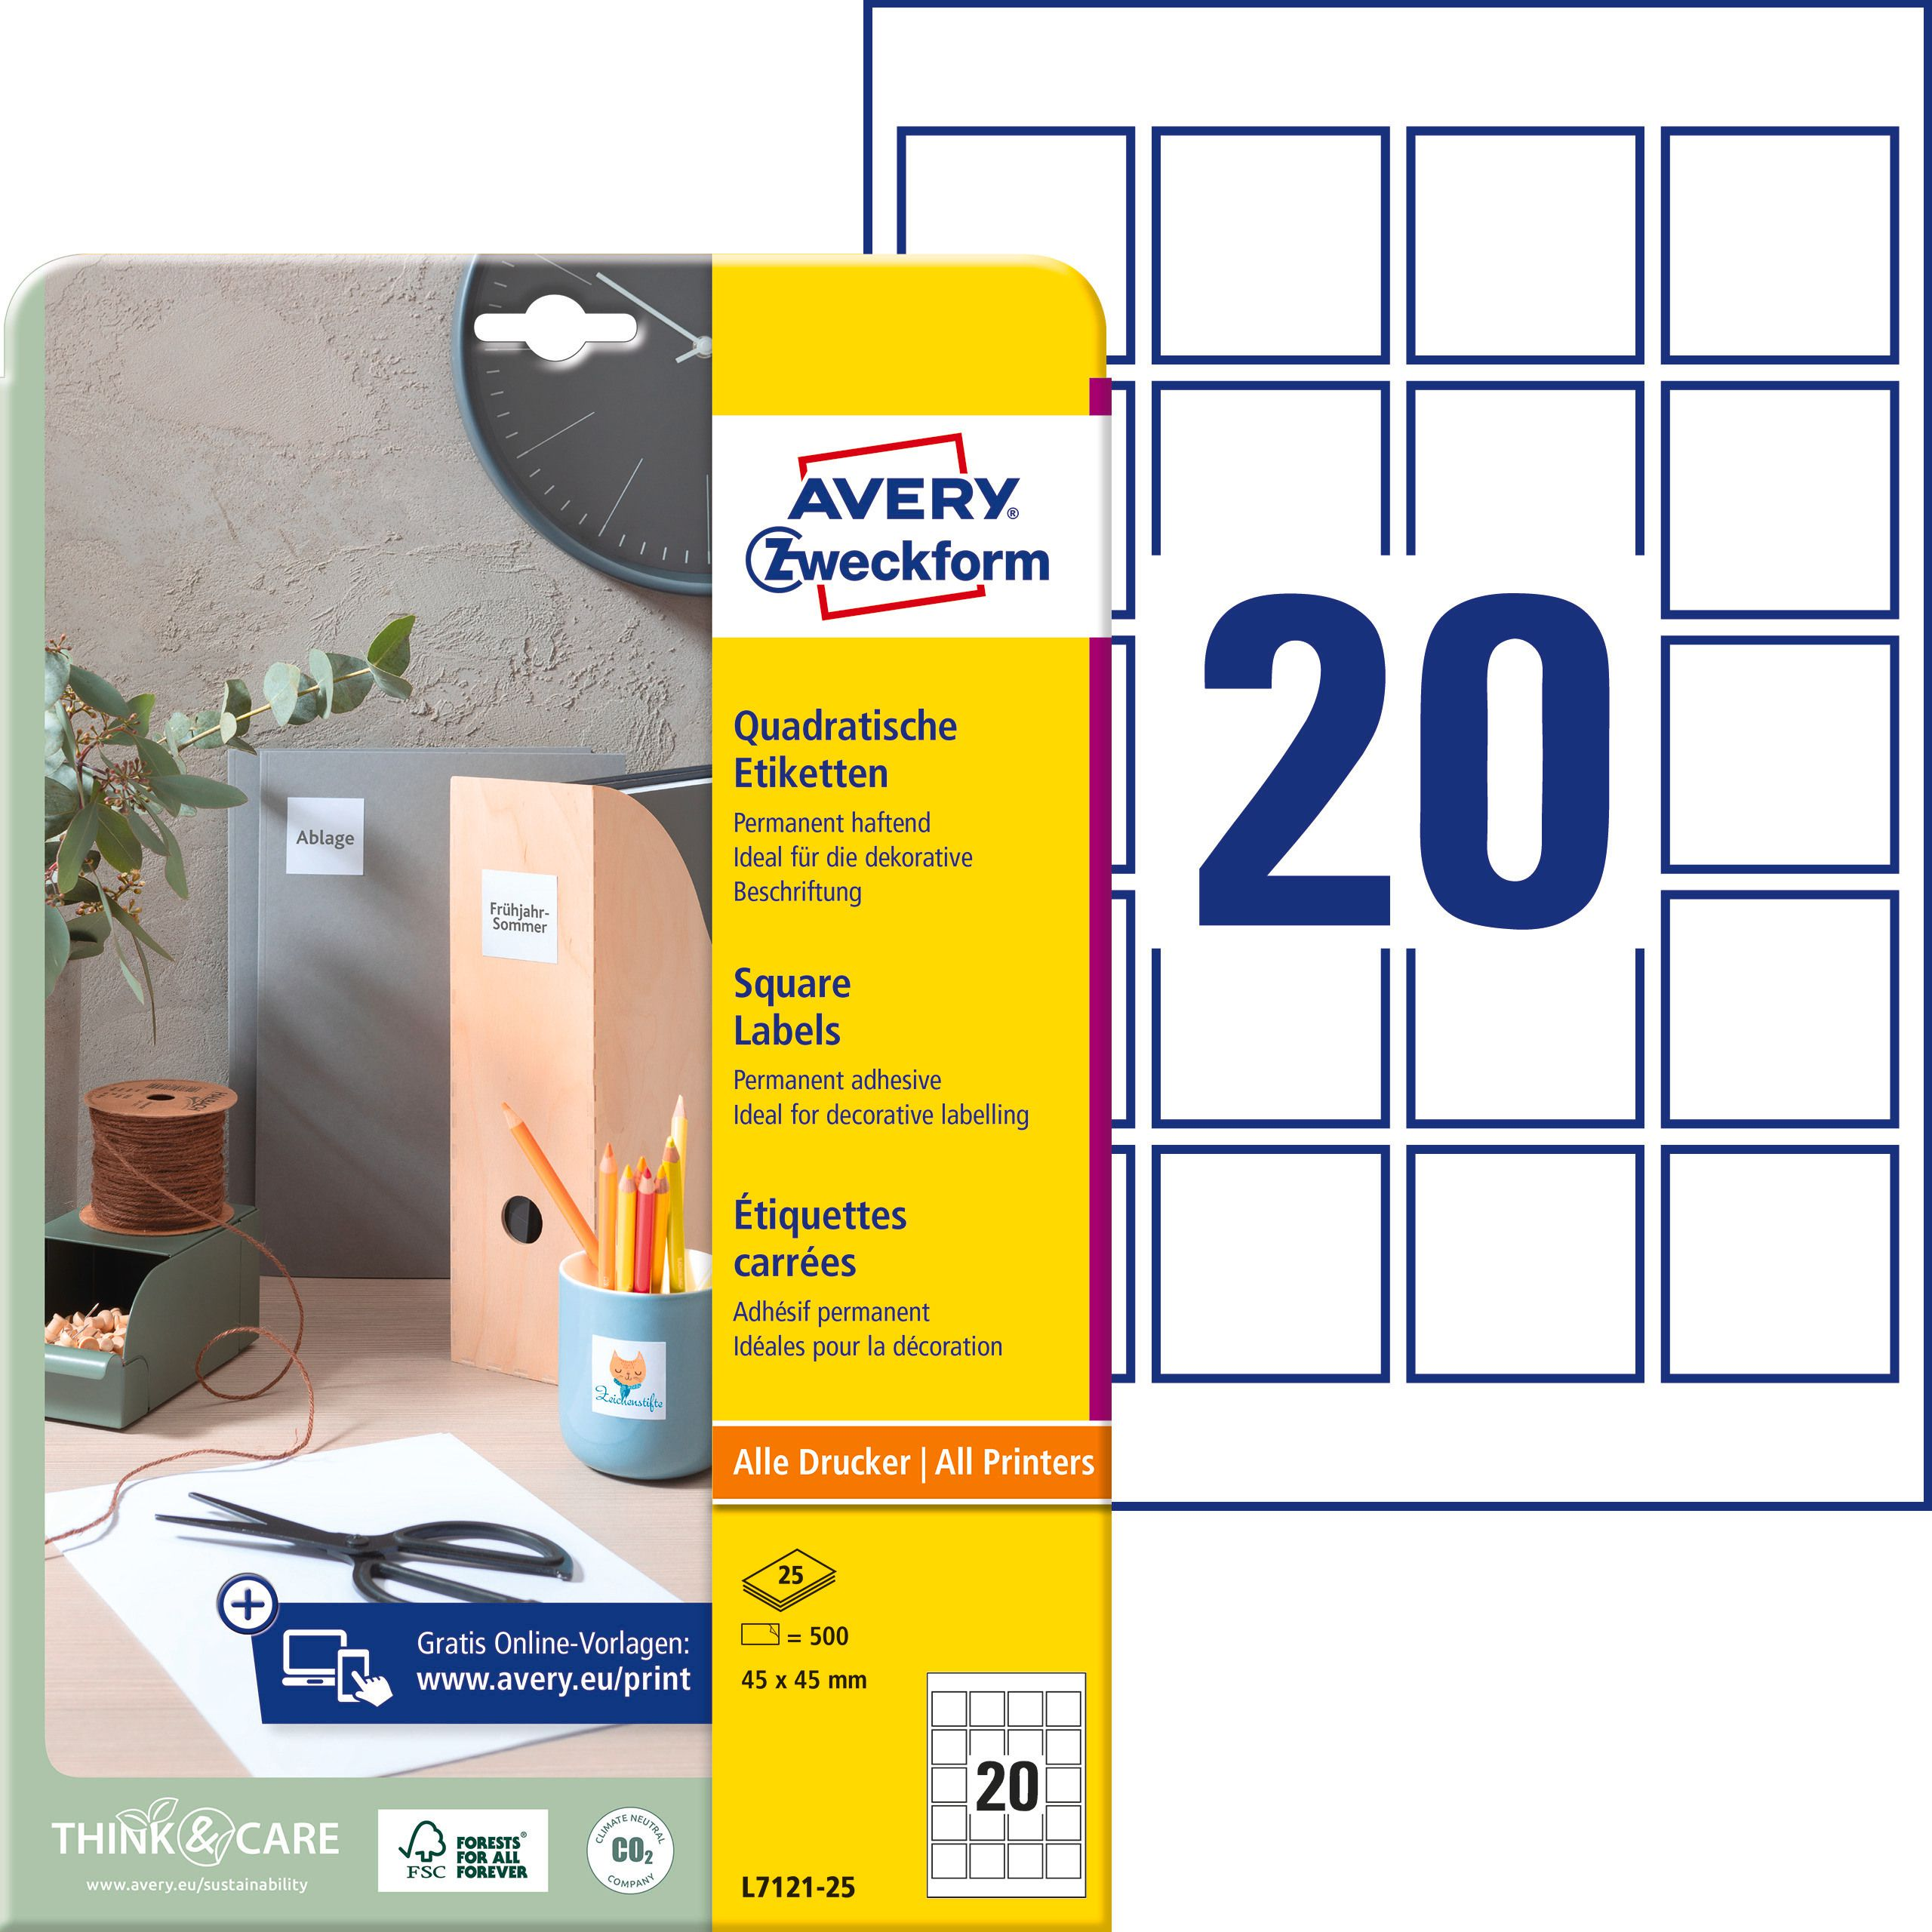 AVERY ZWECKFORM Etiquettes QR Code 45x45mm L7121 25 500 Pcs